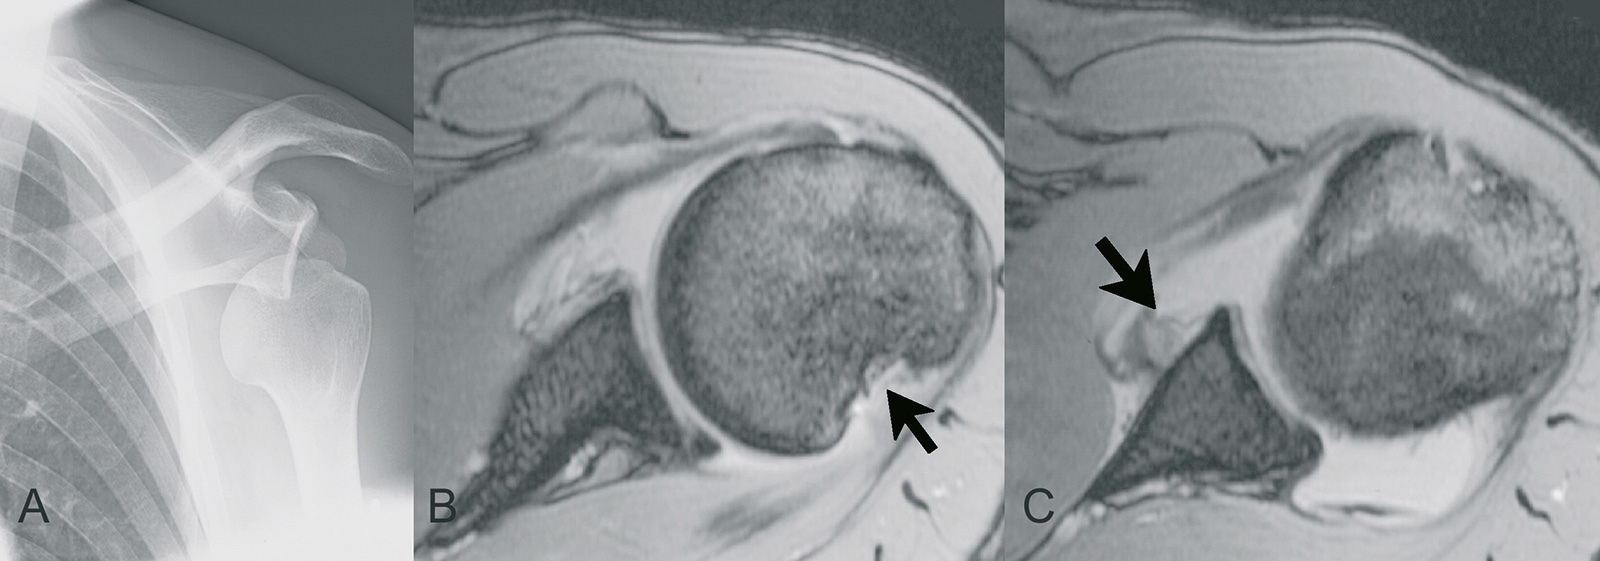 Abb. 2-29: Schulterluxation im AP-Röntgenbild (A), MRT-Bildgebung: Hill-Sachs-Läsion (B) und ALPSALäsion (C)